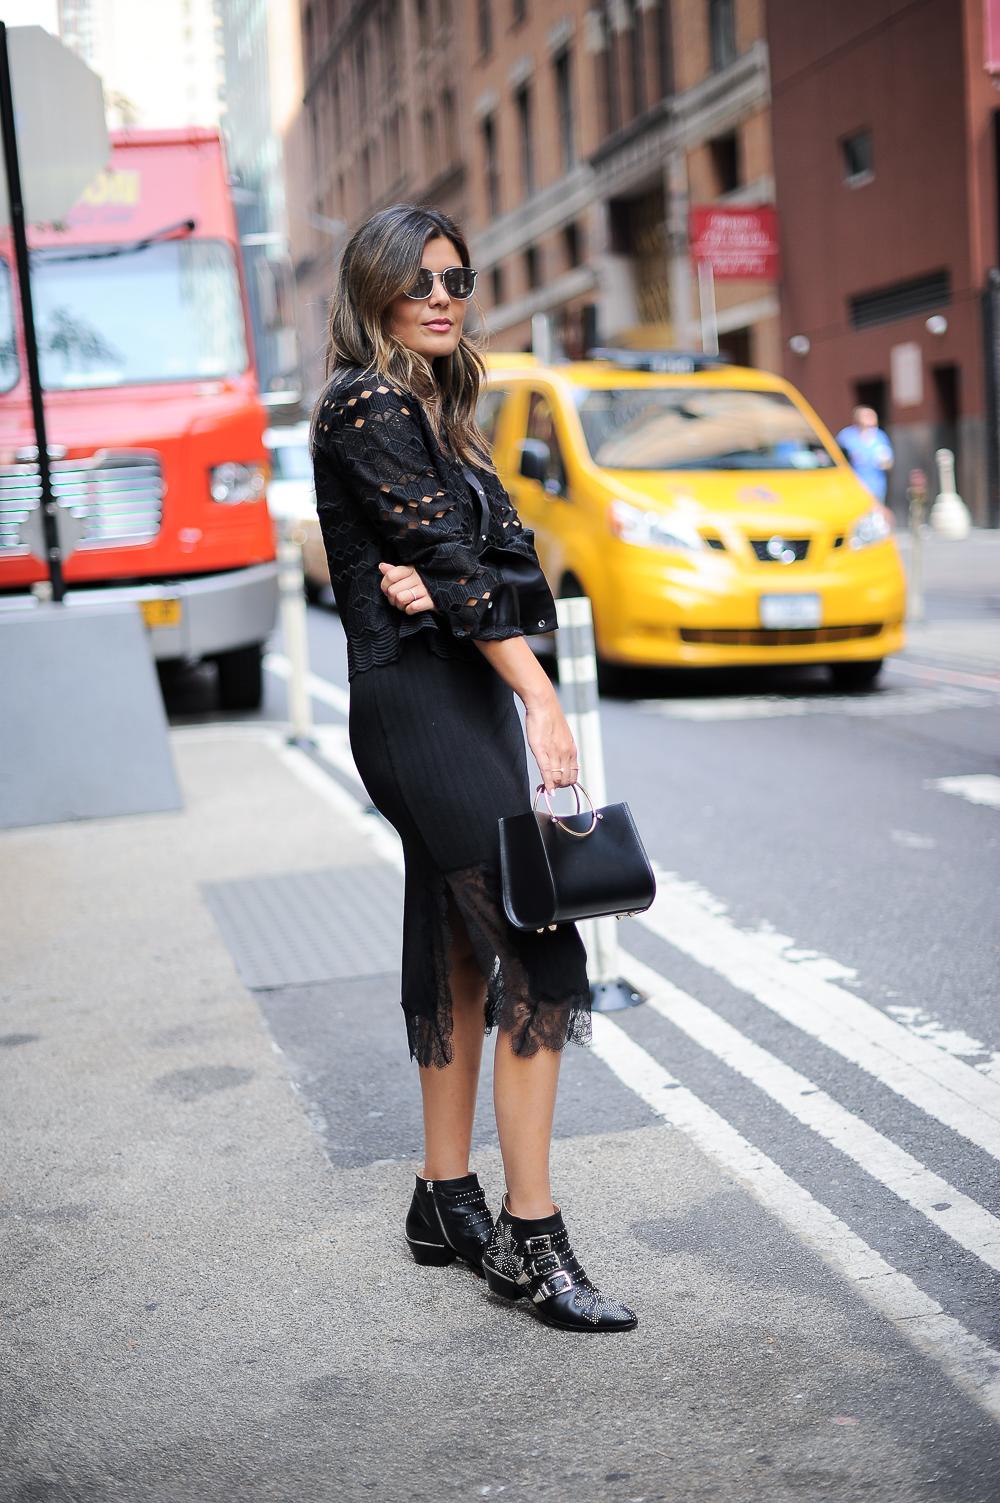 Style MBA Wears Chloe Boots, Sandro Jacket, Future Glory Bag